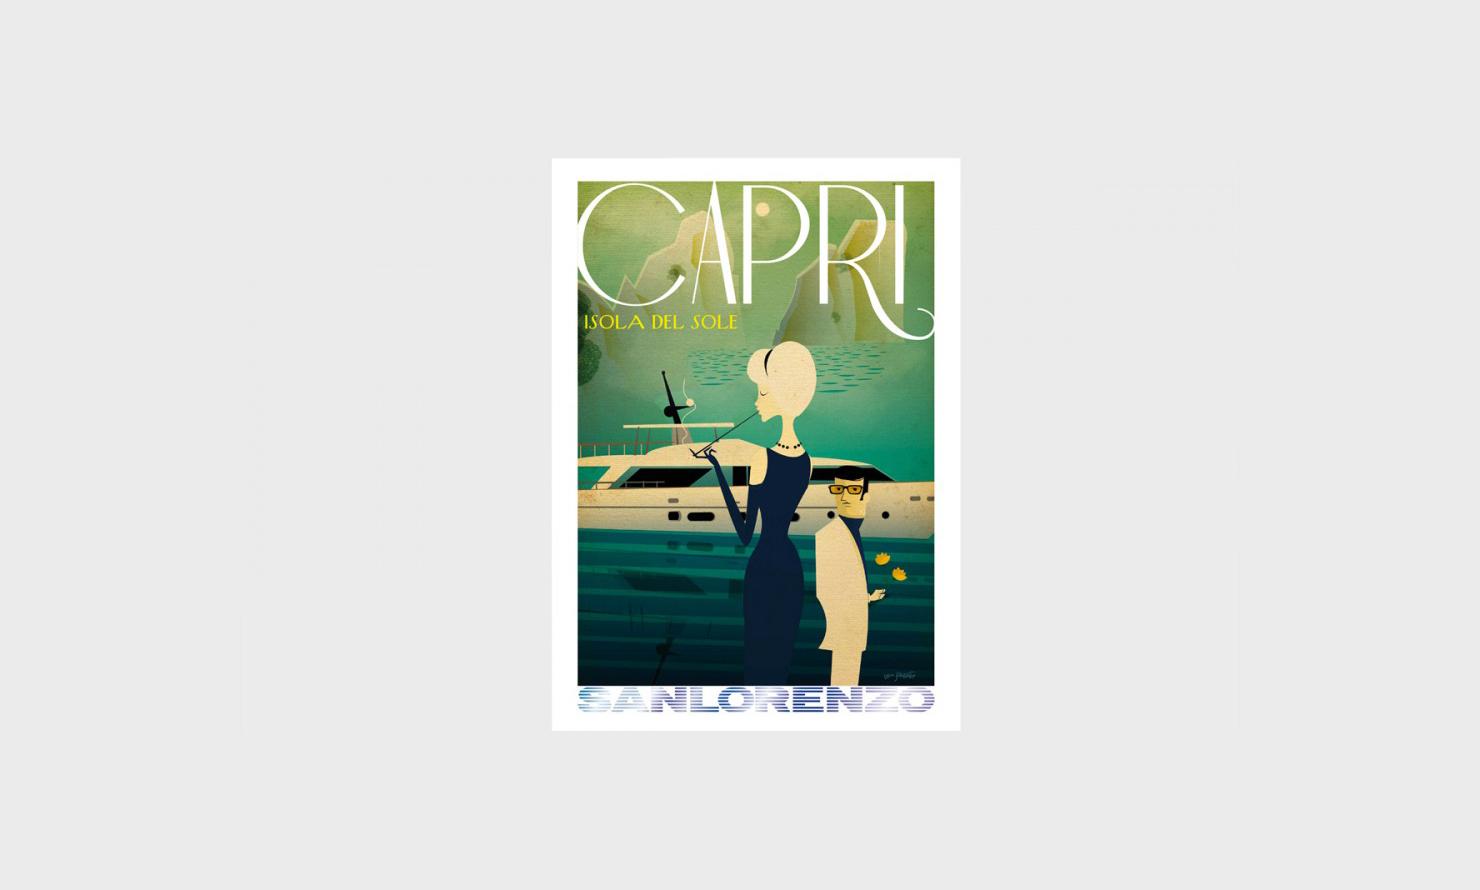 https://kubelibre.com/uploads/Slider-work-tutti-clienti/sanlorenzo-yacht-made-to-measure-yacht-since-1958-poster-11.jpg